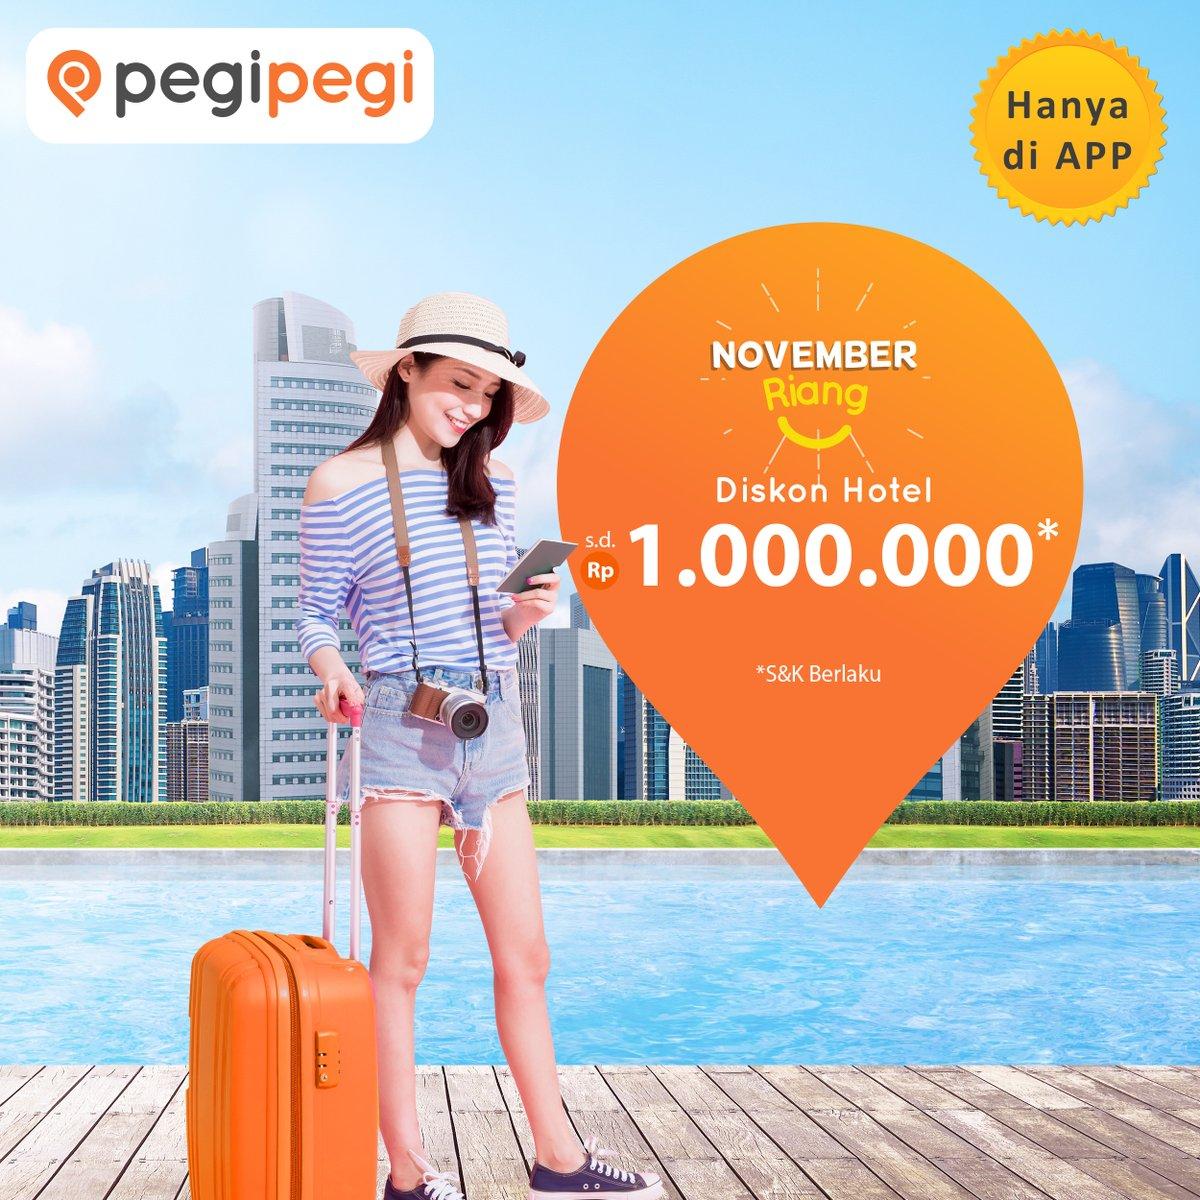 PegiPegi - Promo Kupon Diskon Hotel s.d 1juta Via PegiPegi (12 - 14 Nov 2018)